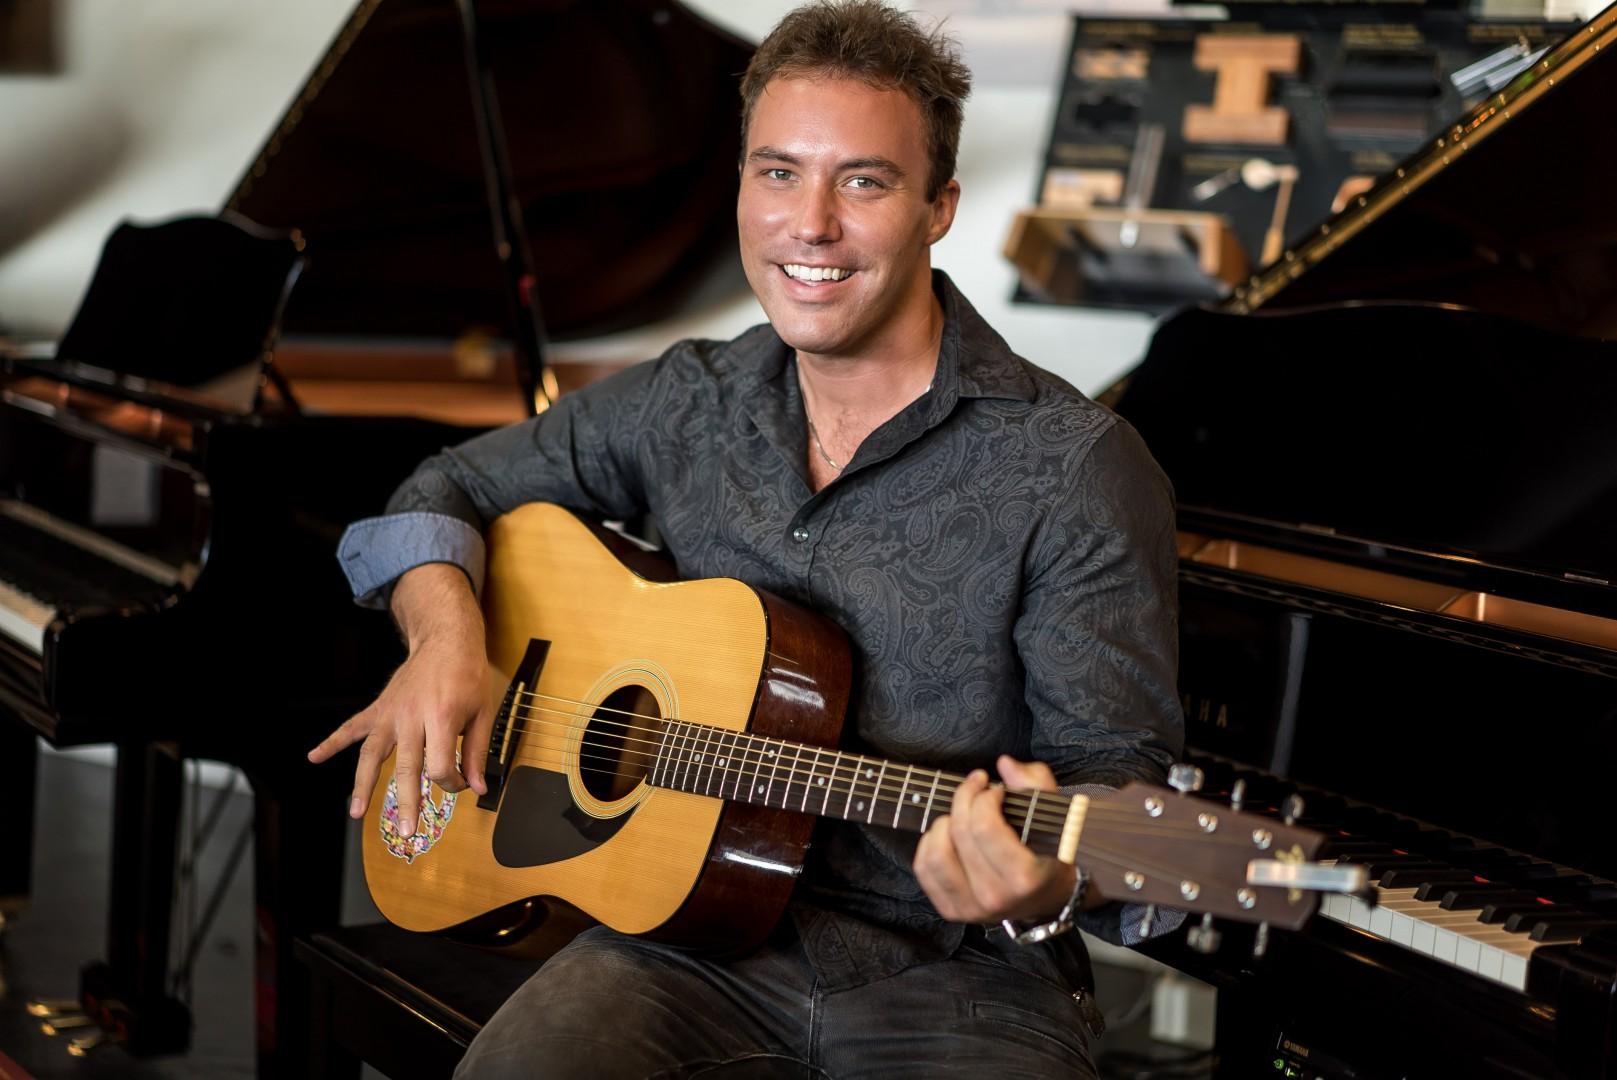 Man smiling while playing guitar at the same time